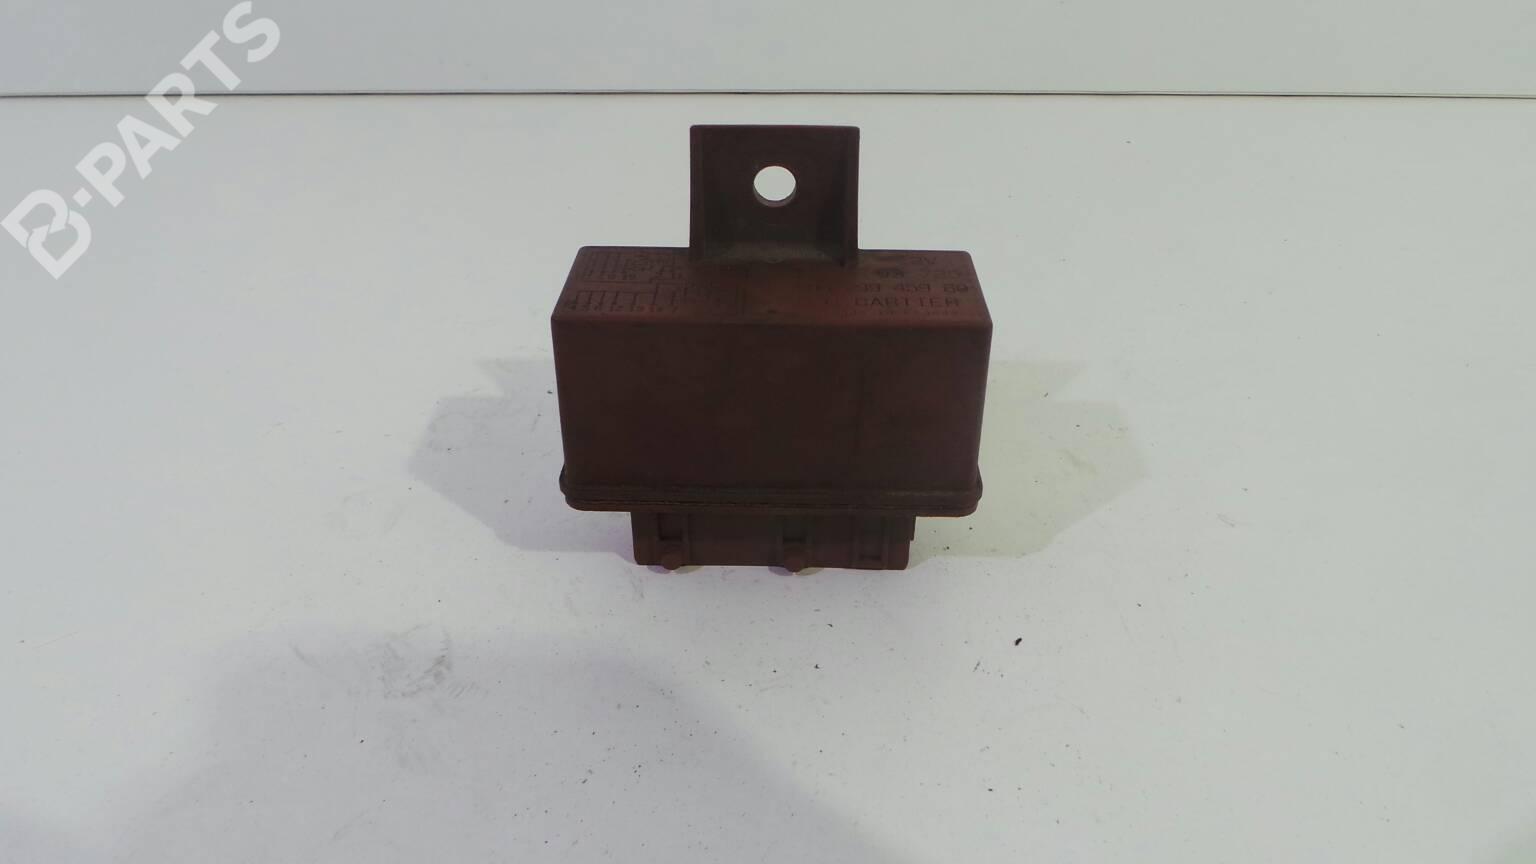 Fuse Box 96 299 459 80 PEUGEOT, 607 (9D, 9U) 2.2 HDI